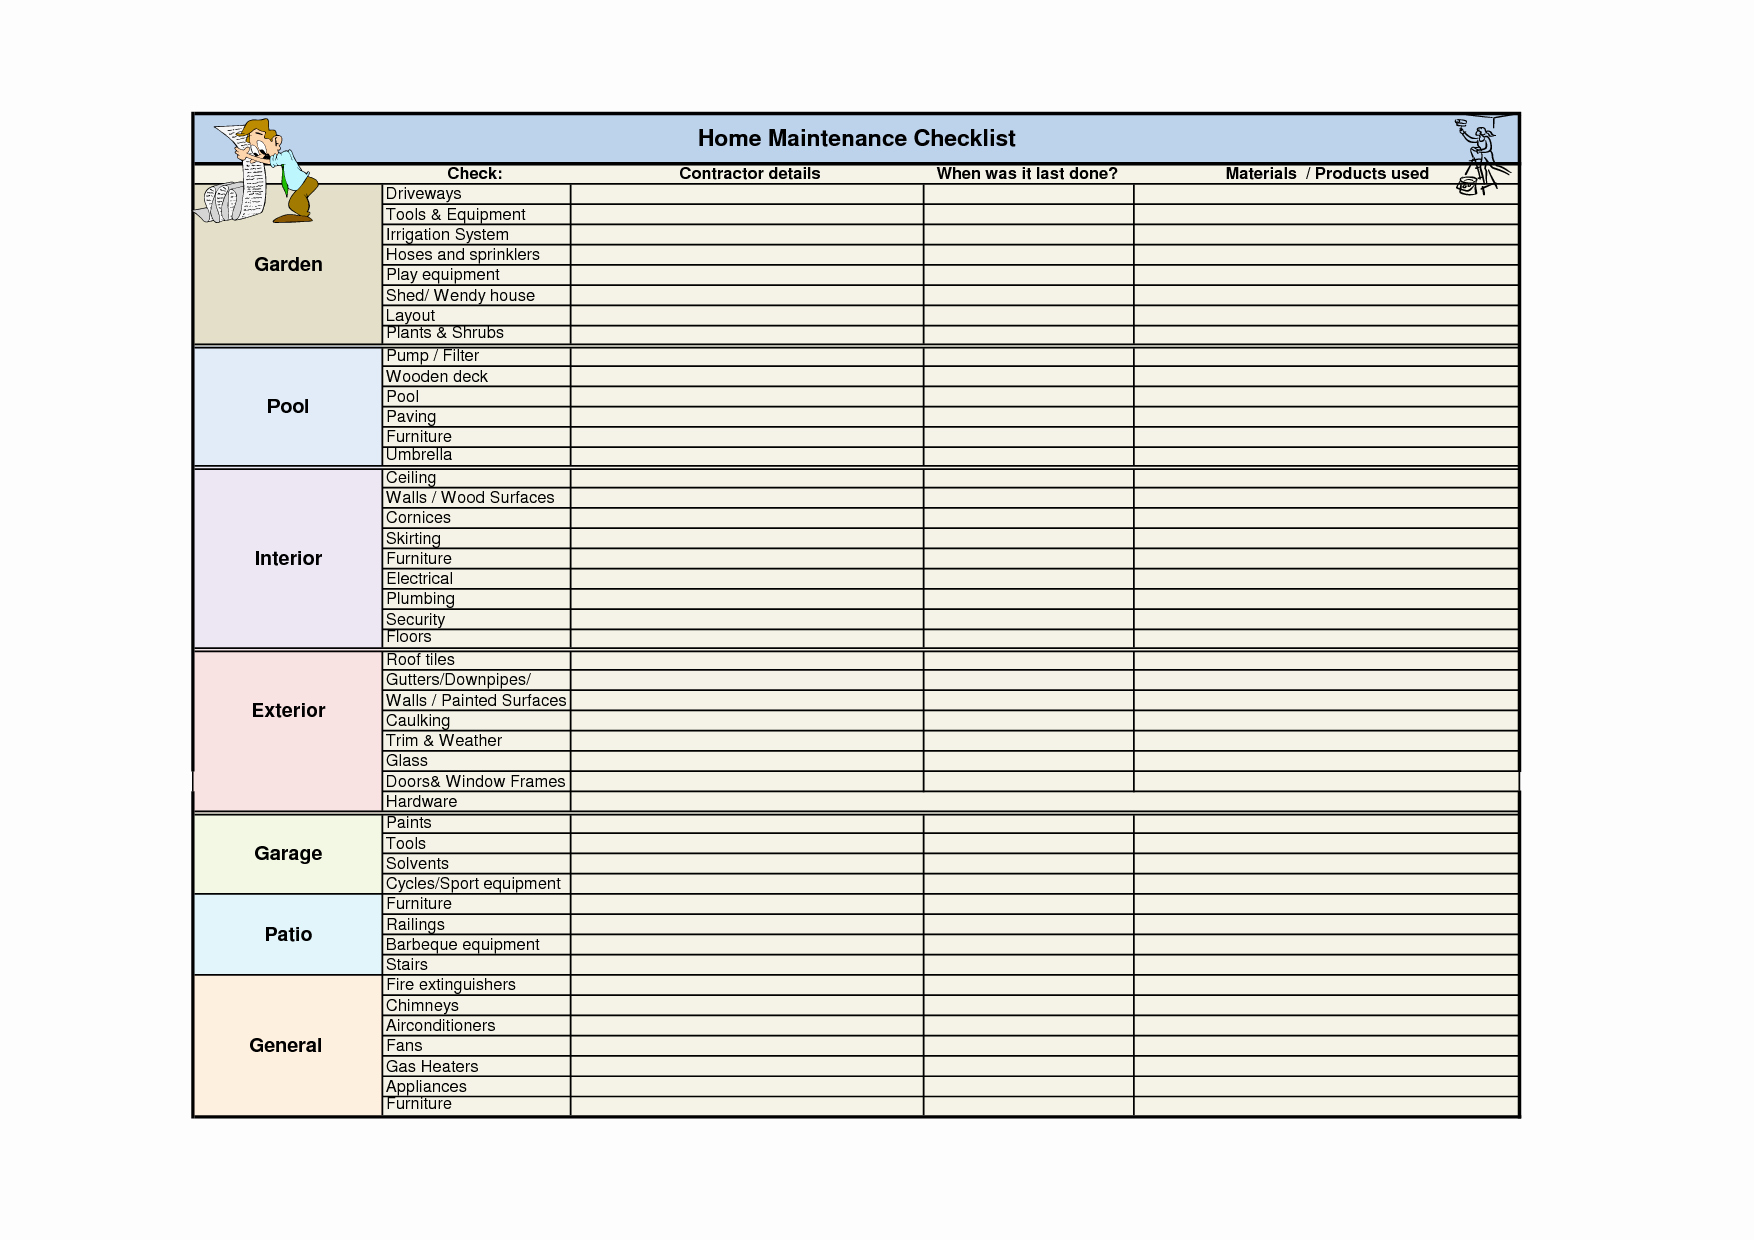 Home Maintenance Checklist Template New Related Keywords & Suggestions for Home Maintenance Checklist